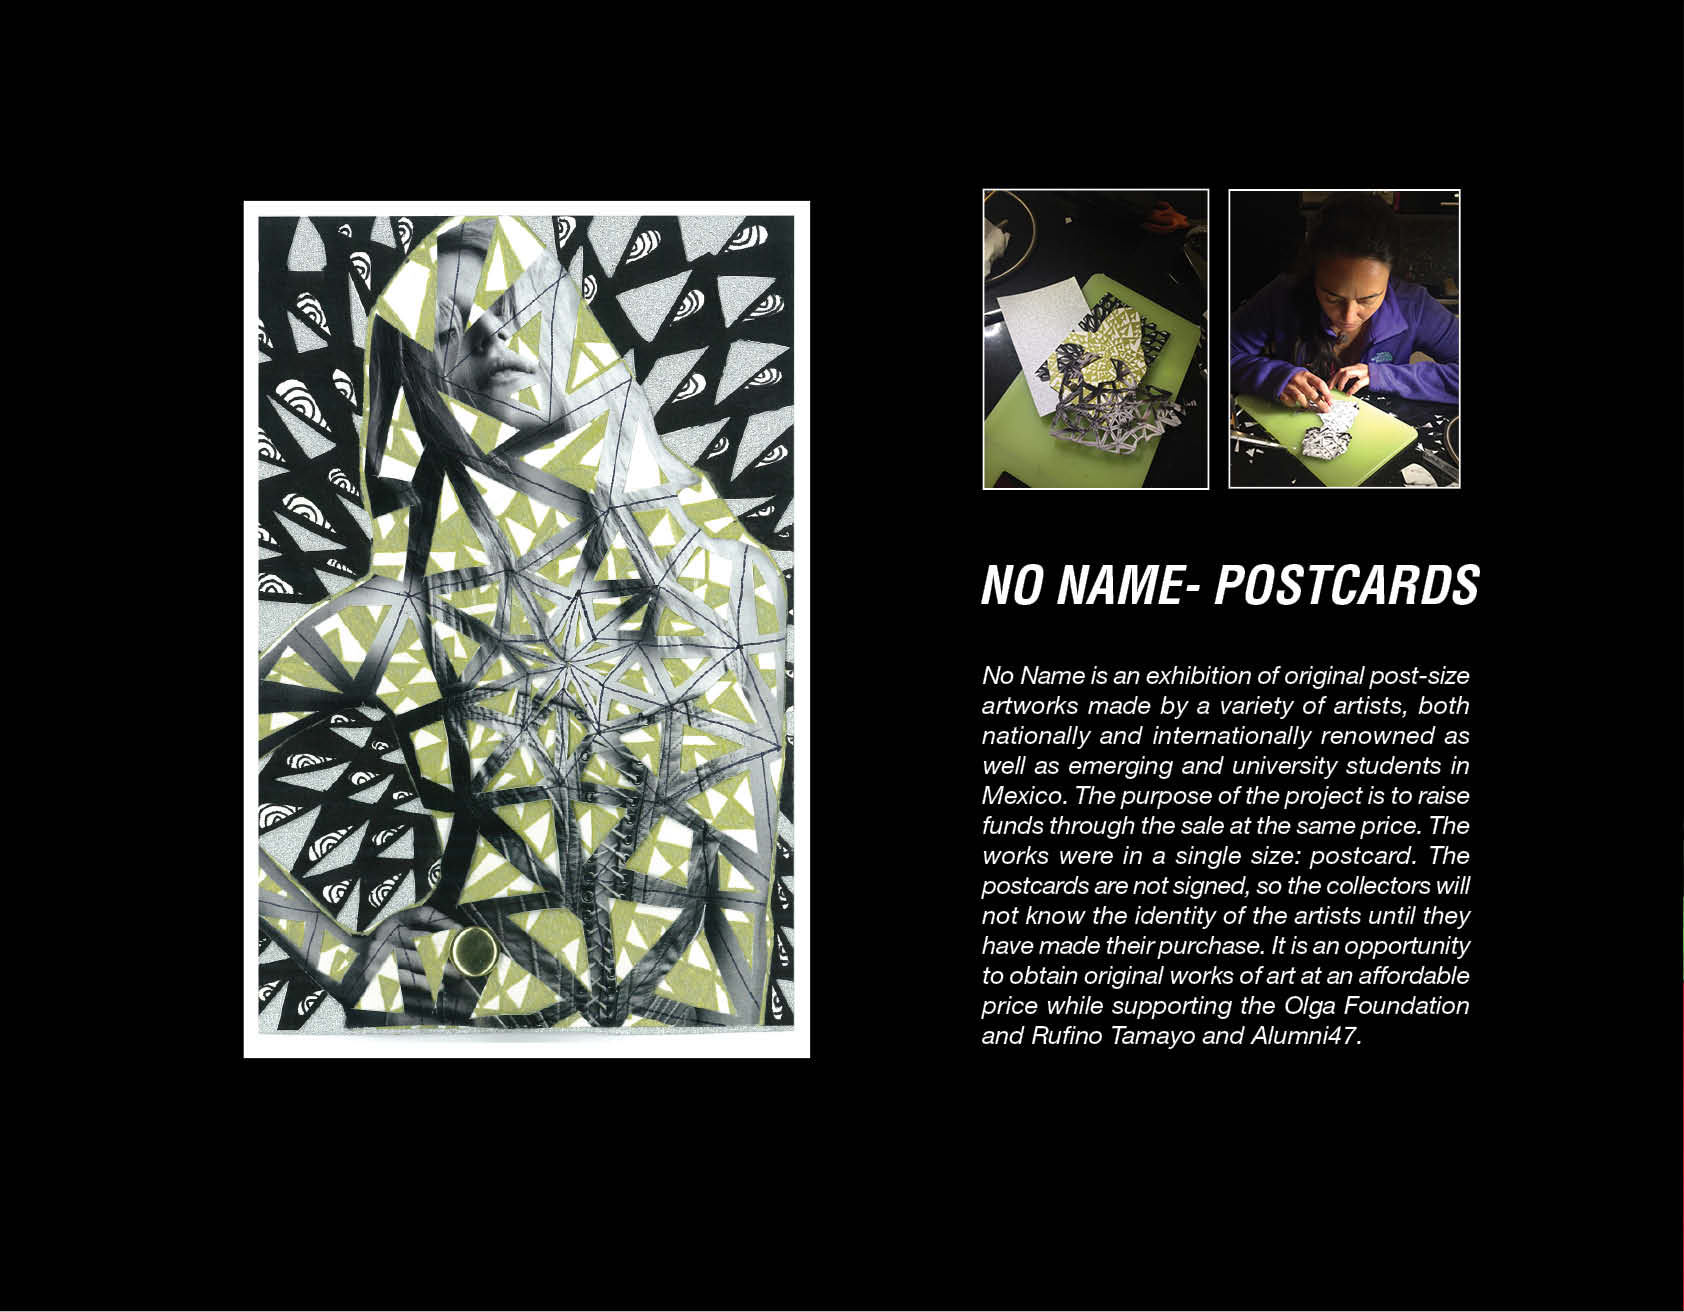 Postcard NO NAME 2.jpg